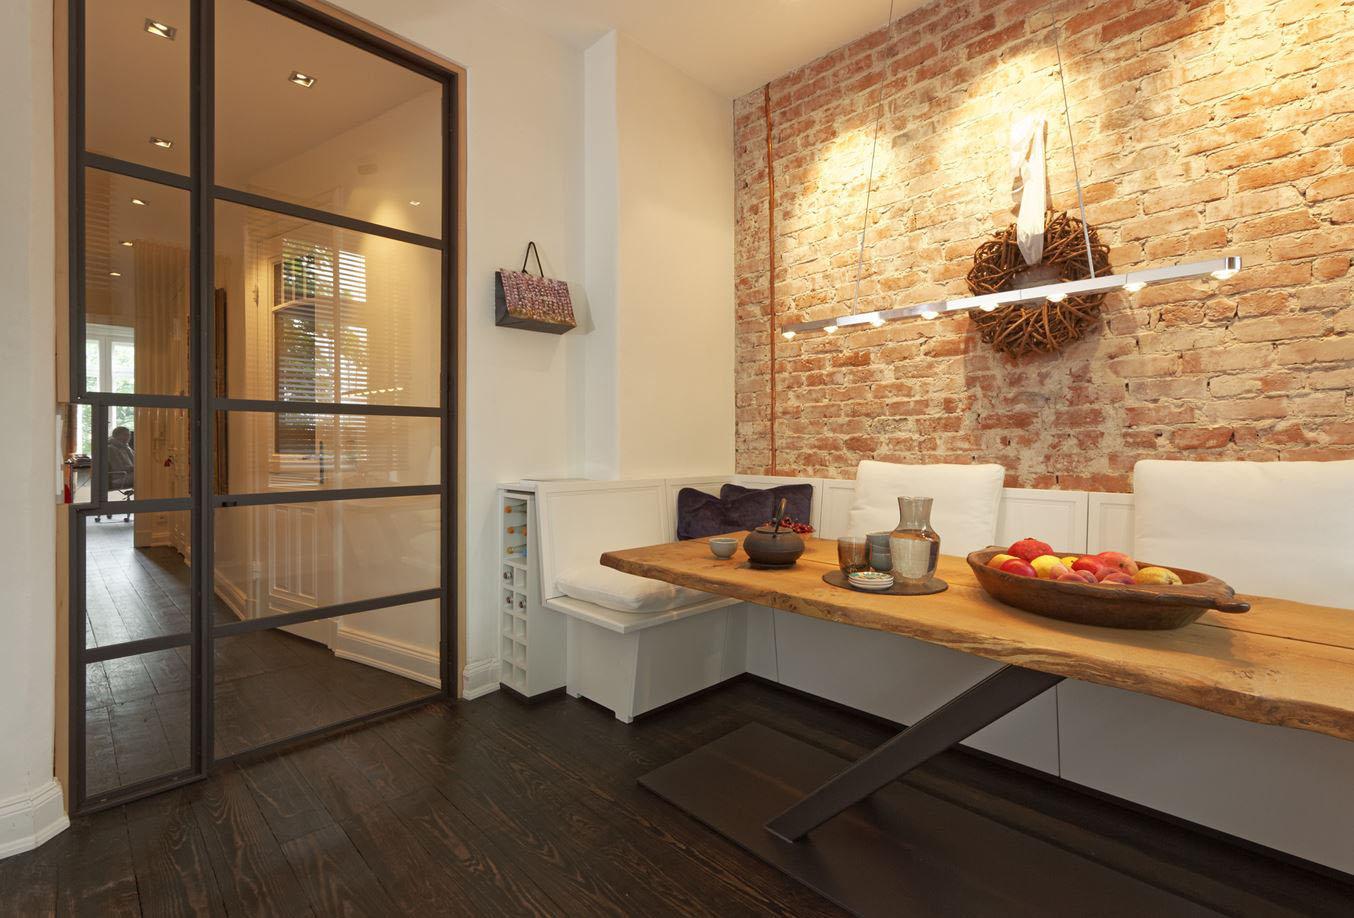 Decorating Bedroom With Brick Walls